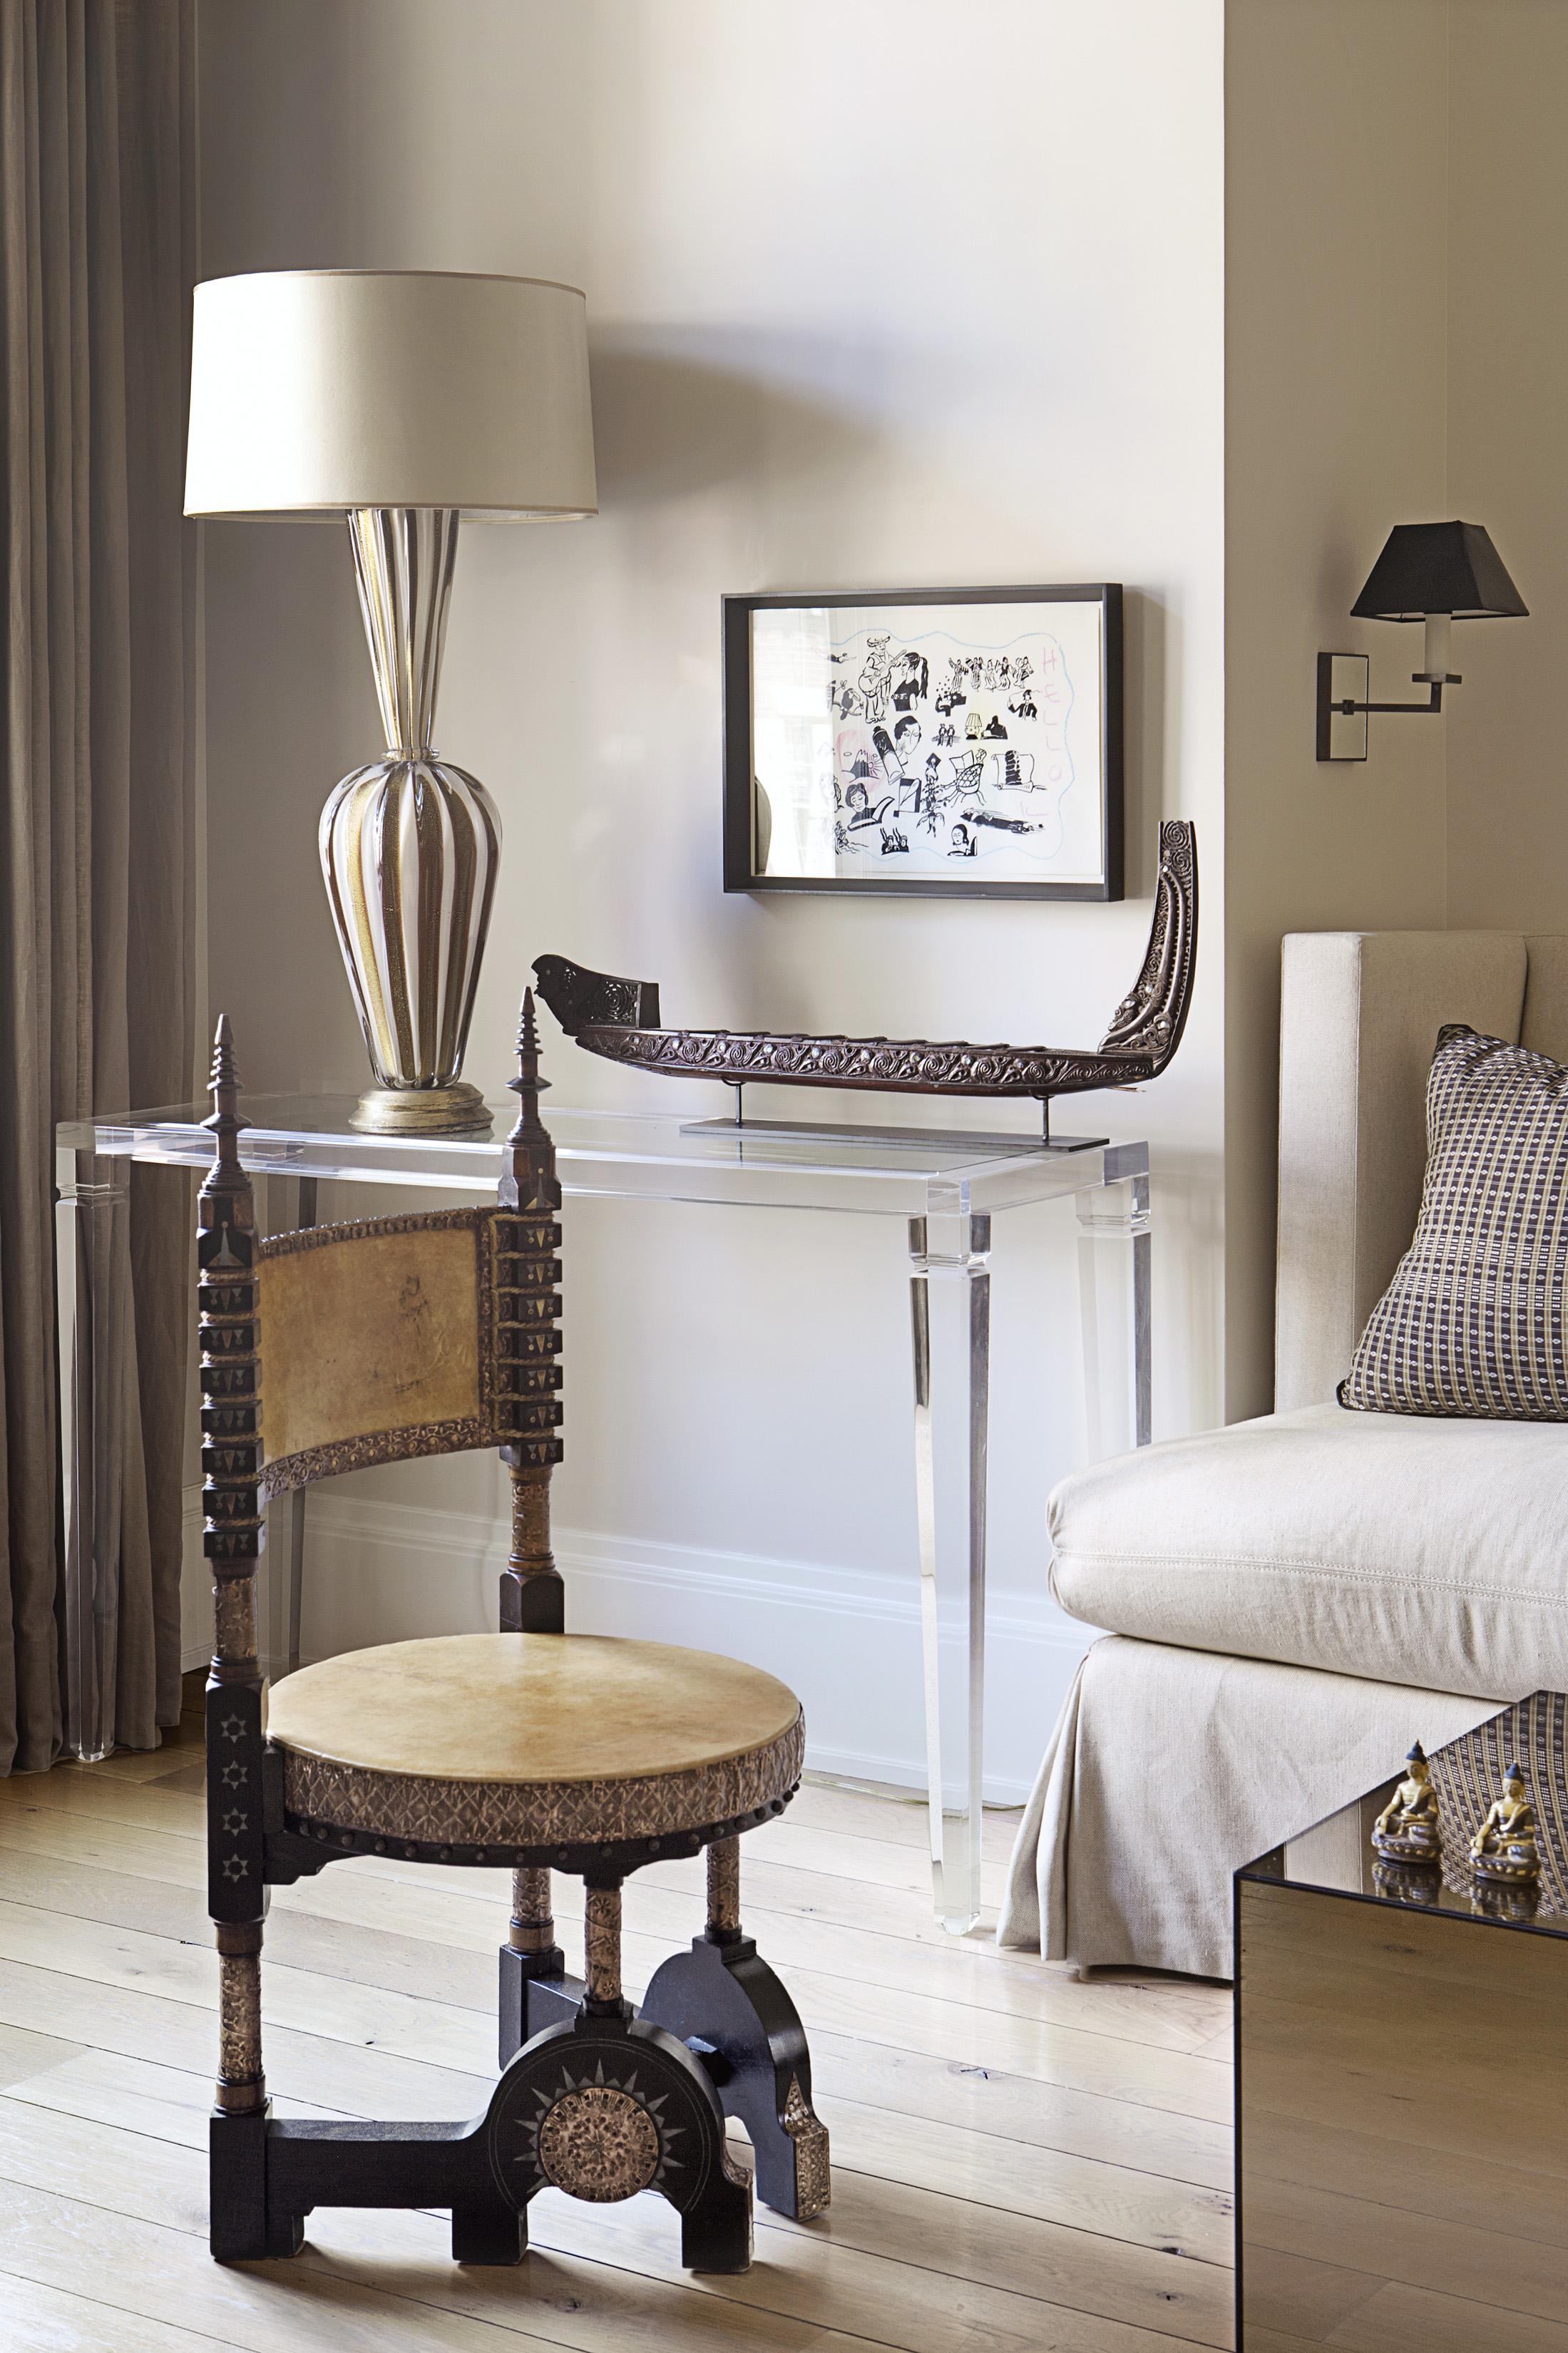 Carlo Bugatti Chair in living room of Sandra Nunnerley